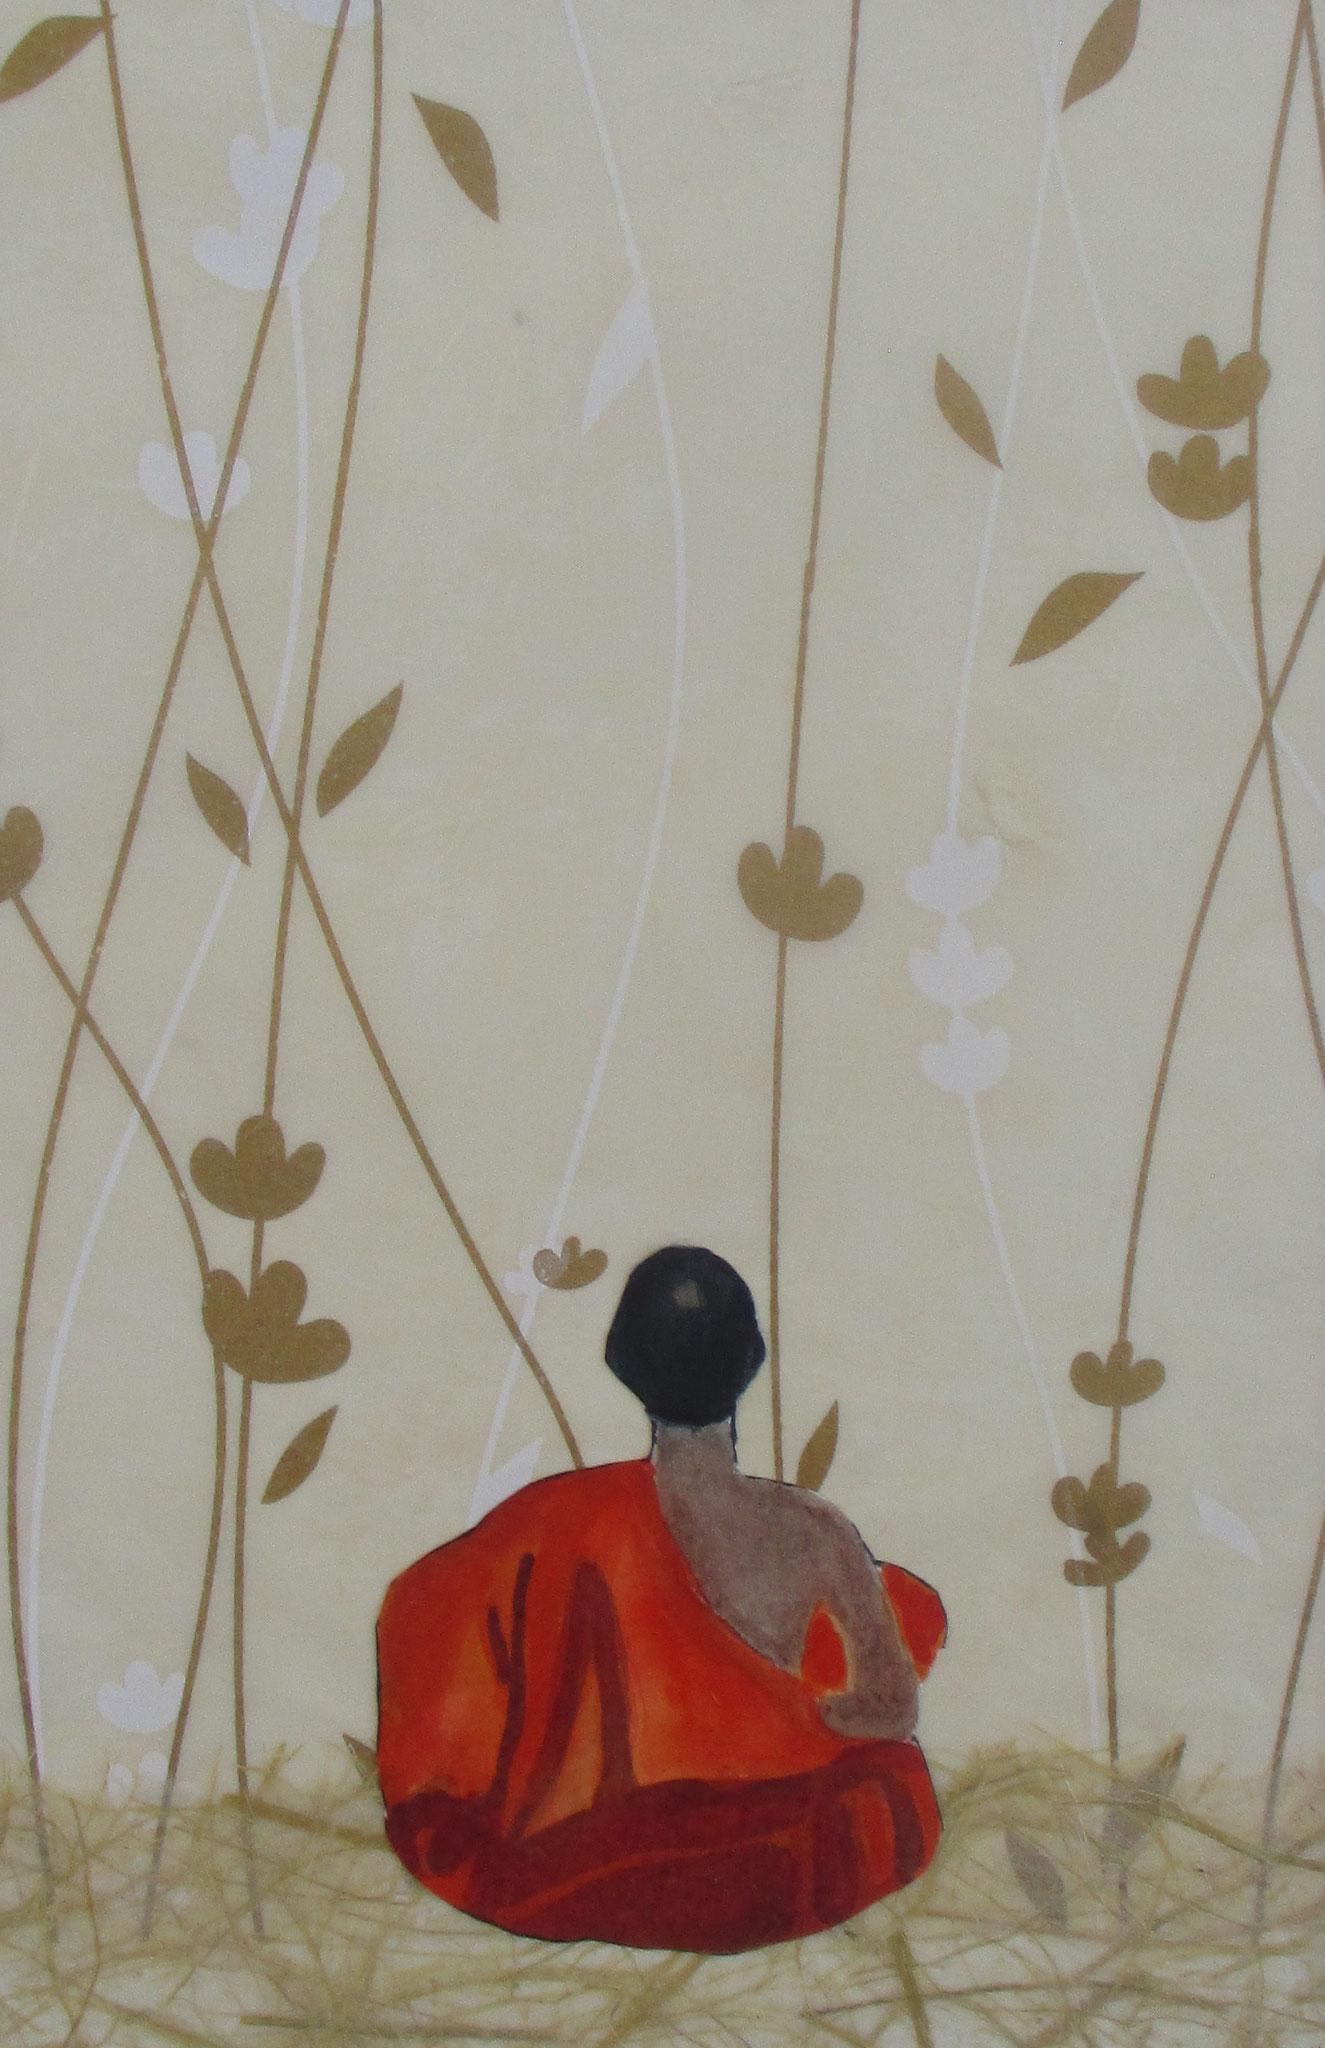 Ohbayashi (Senkoji Monk), watercolor, collage, 12 x 16, matted, 2019